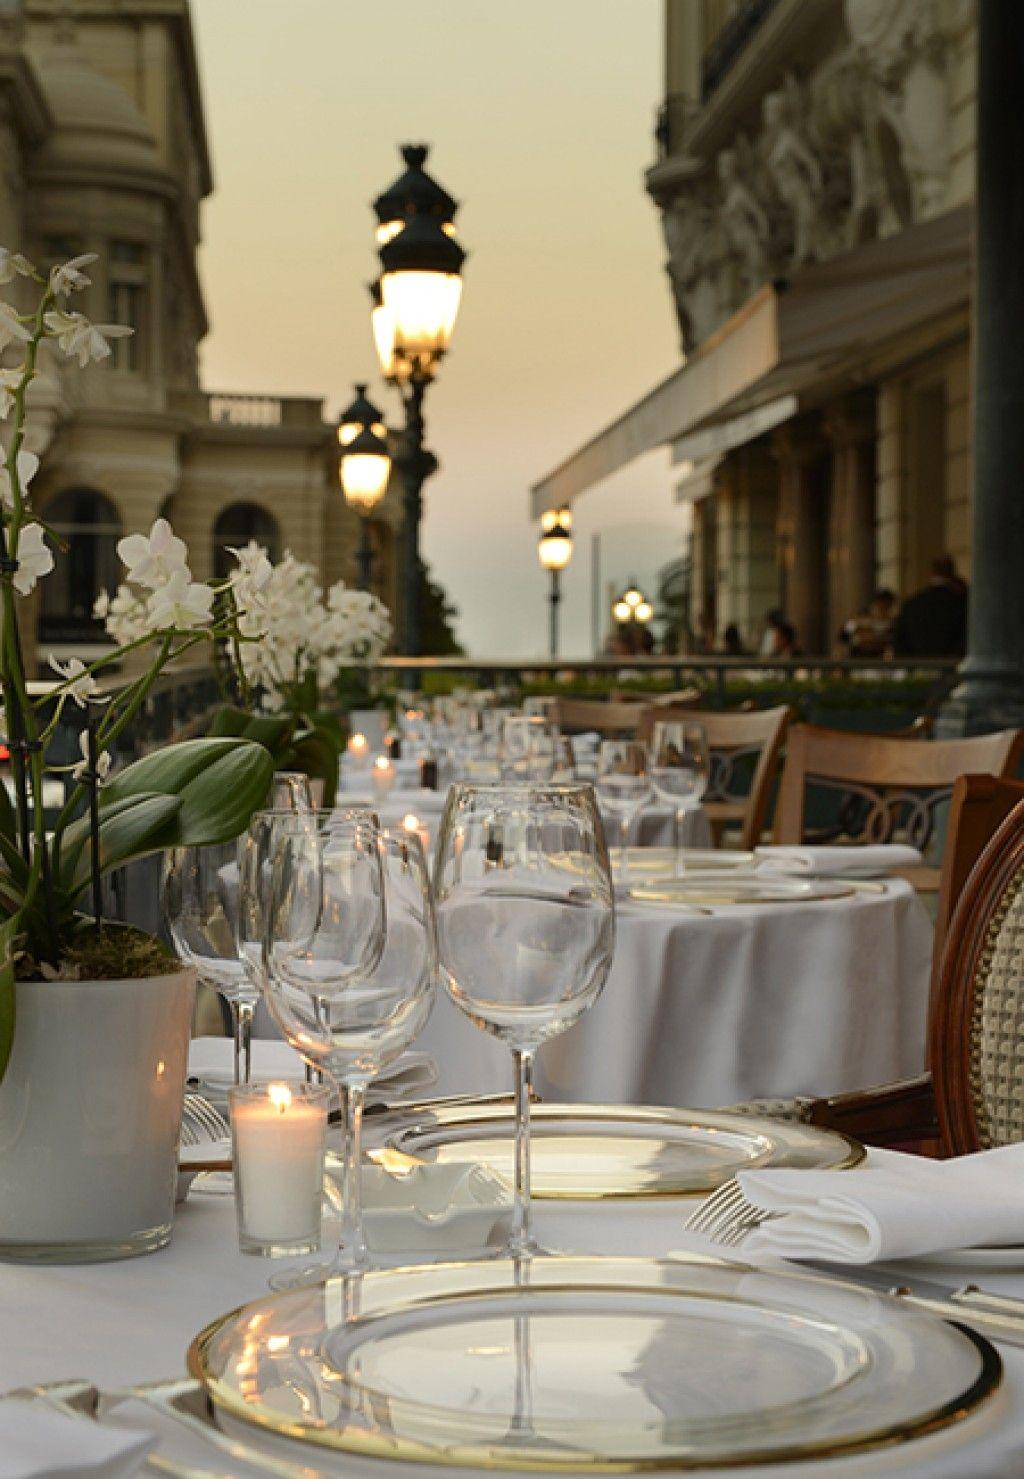 Fancy Restaurant in Paris at Night